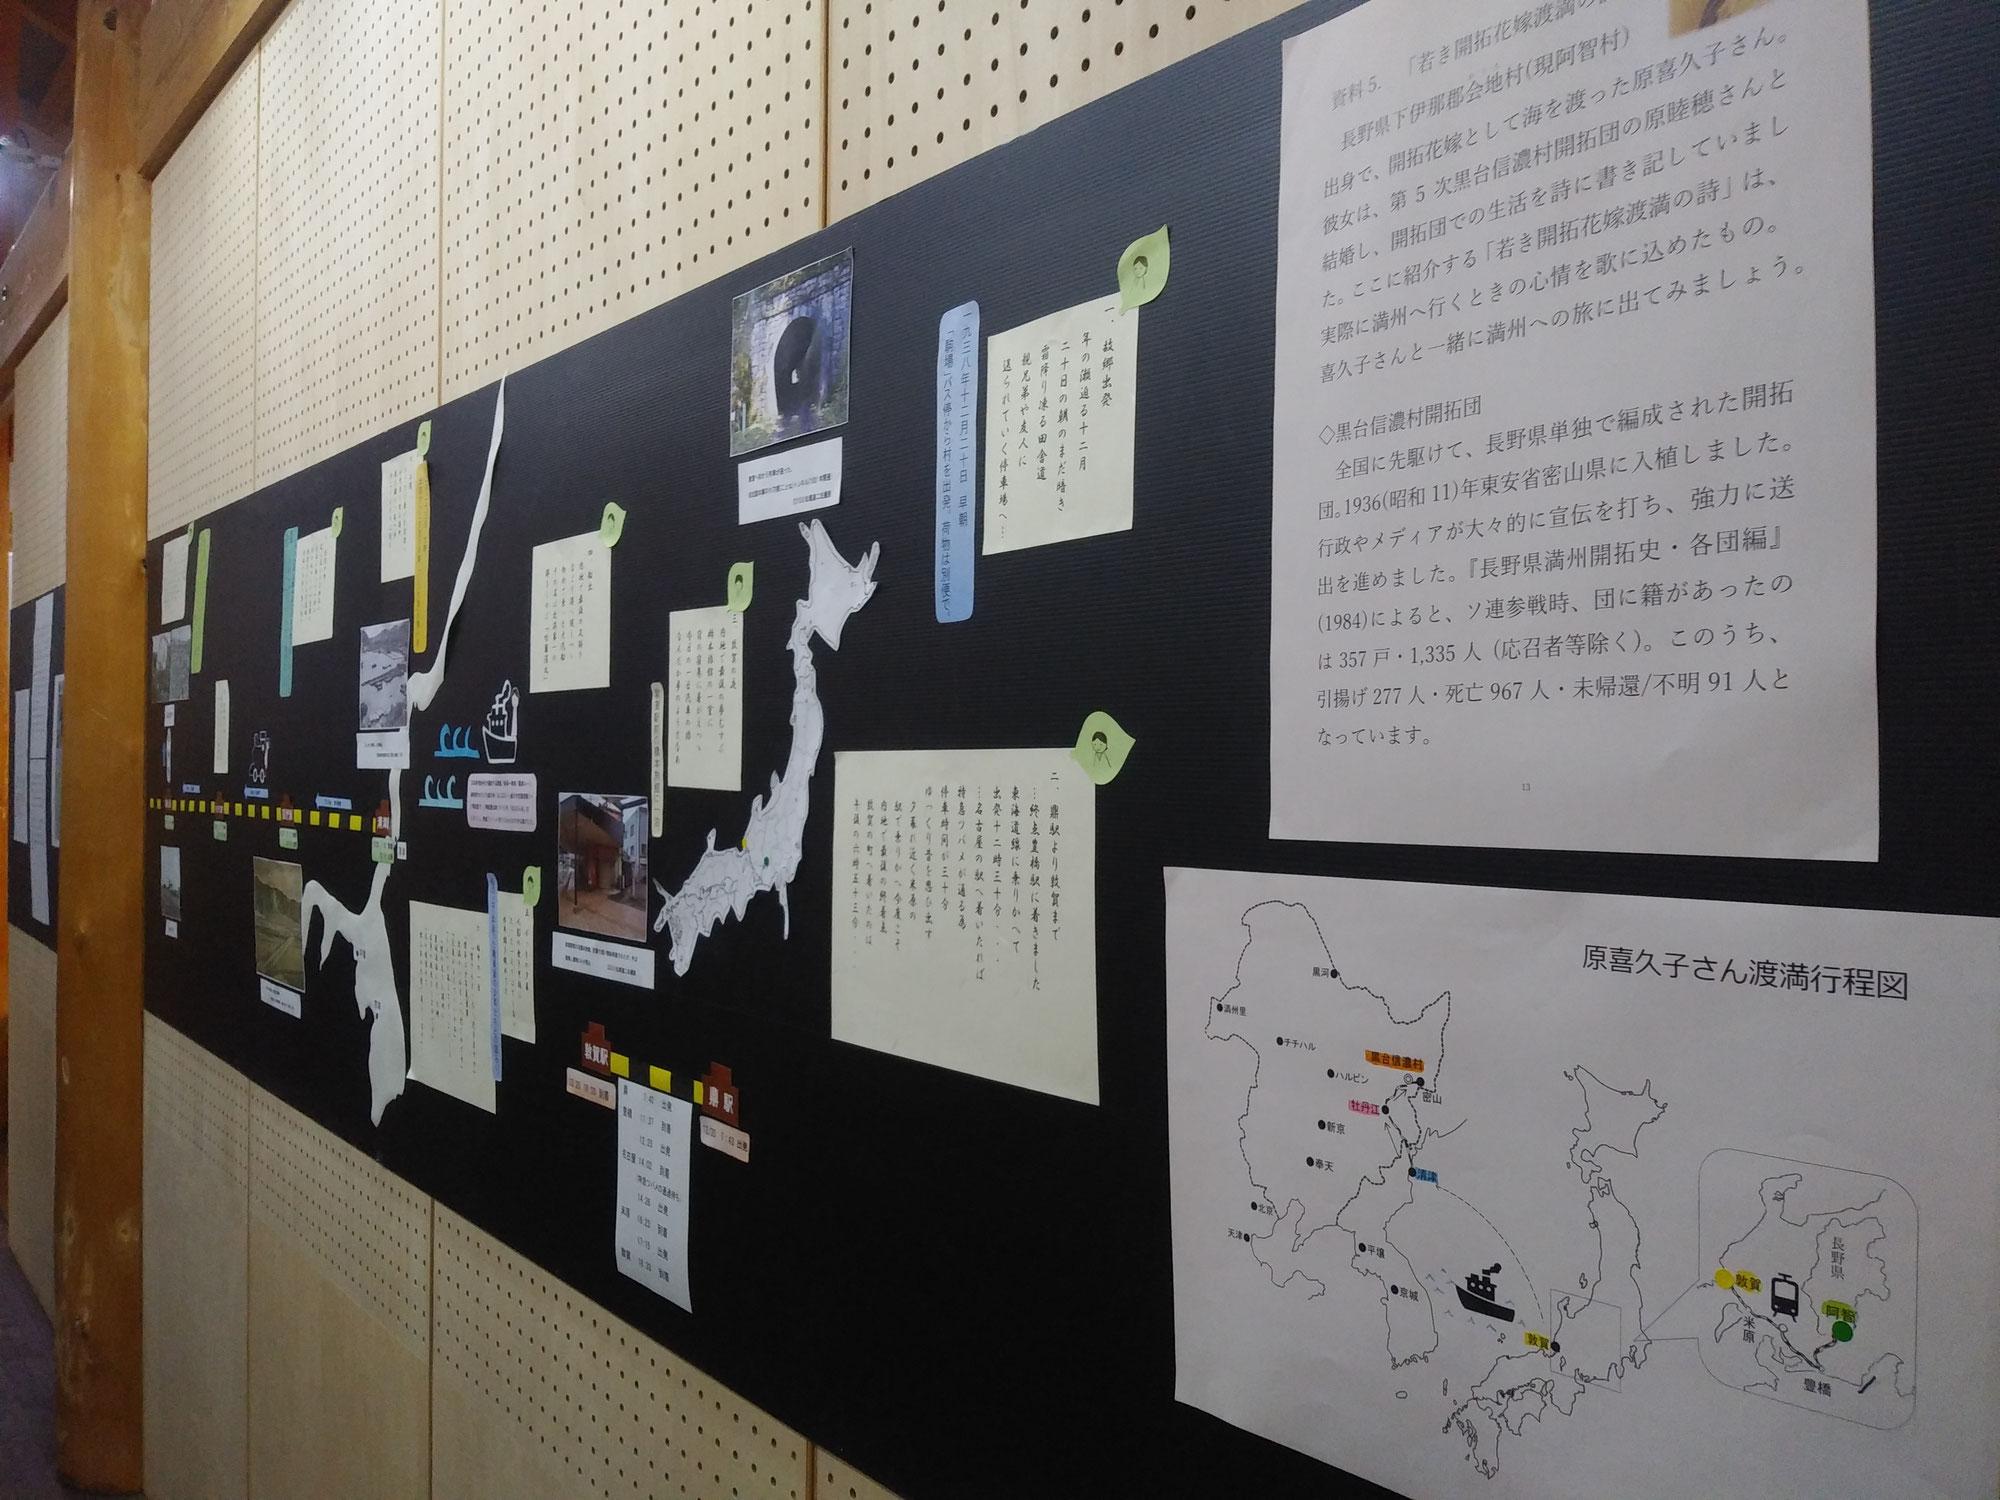 秋季特別展「寄贈品展vol.2 満州と旅」開催